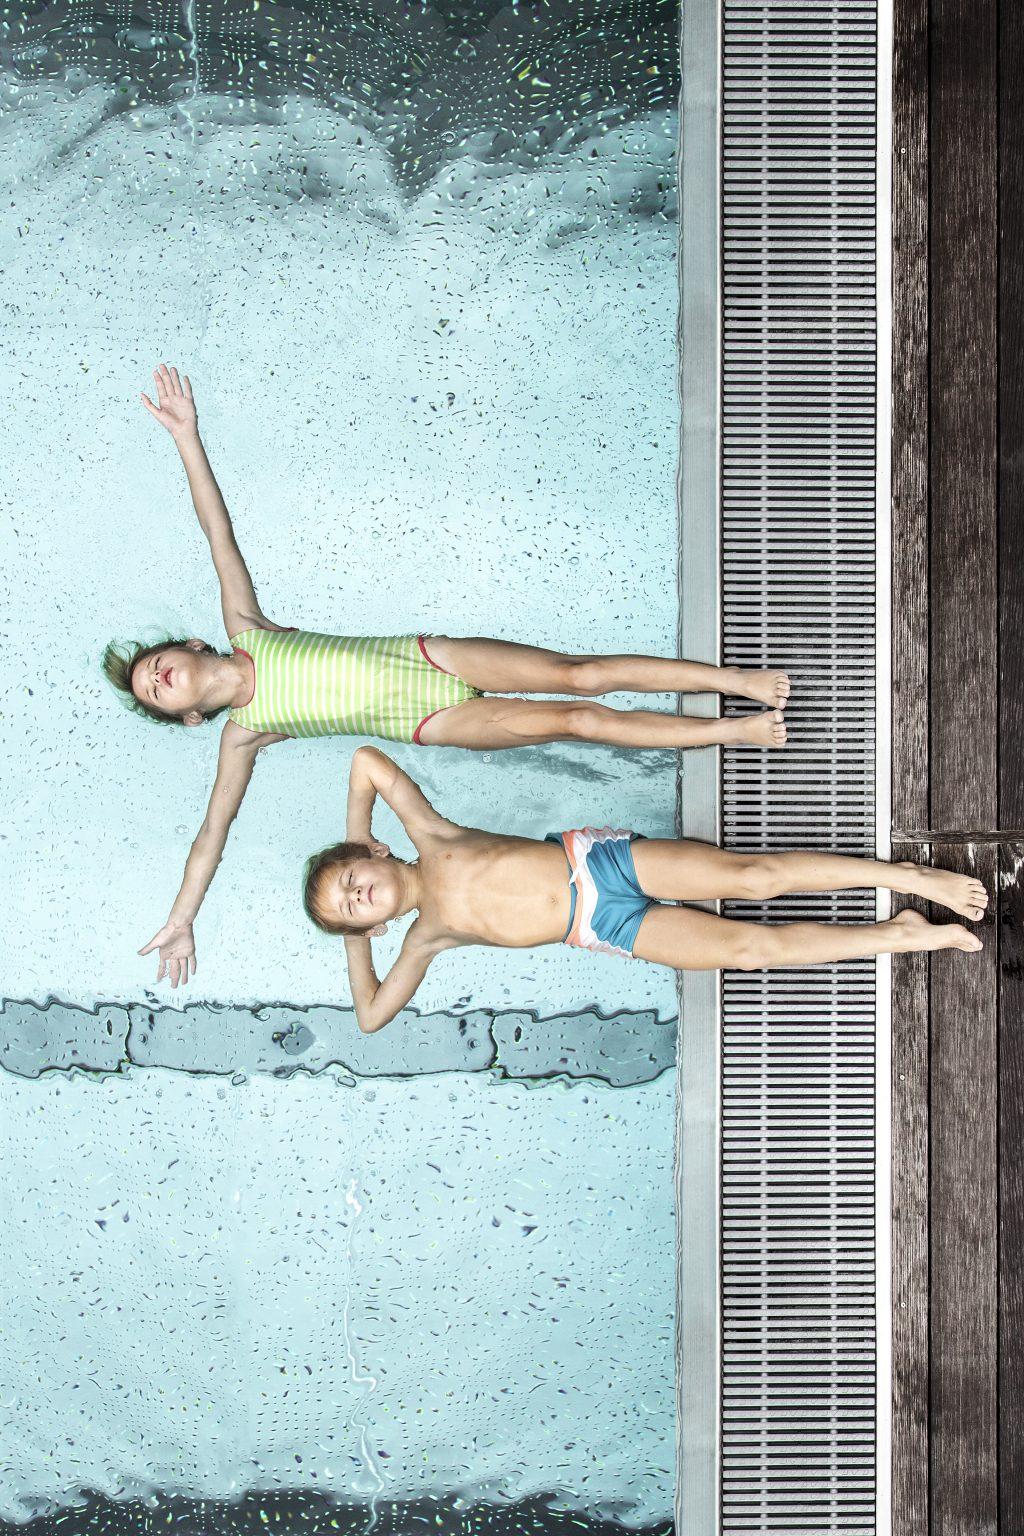 kinder_entspannen_am_pool_c_daniela_jakob_dachsteinkoenig_-_familux_resort